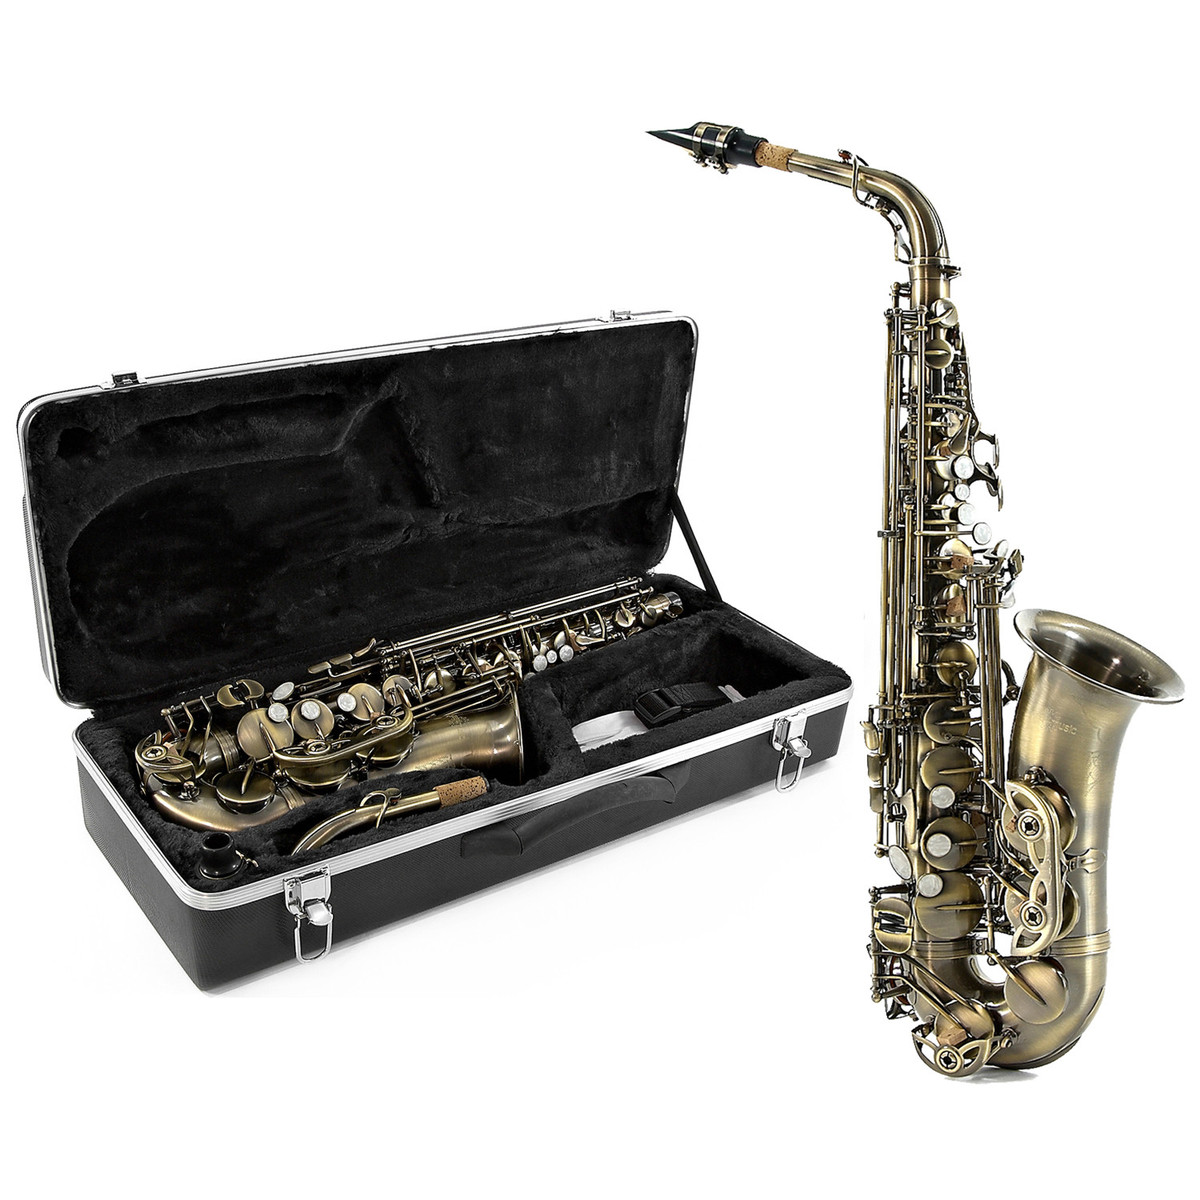 saxophone alto par gear4music vintage comme neuf. Black Bedroom Furniture Sets. Home Design Ideas